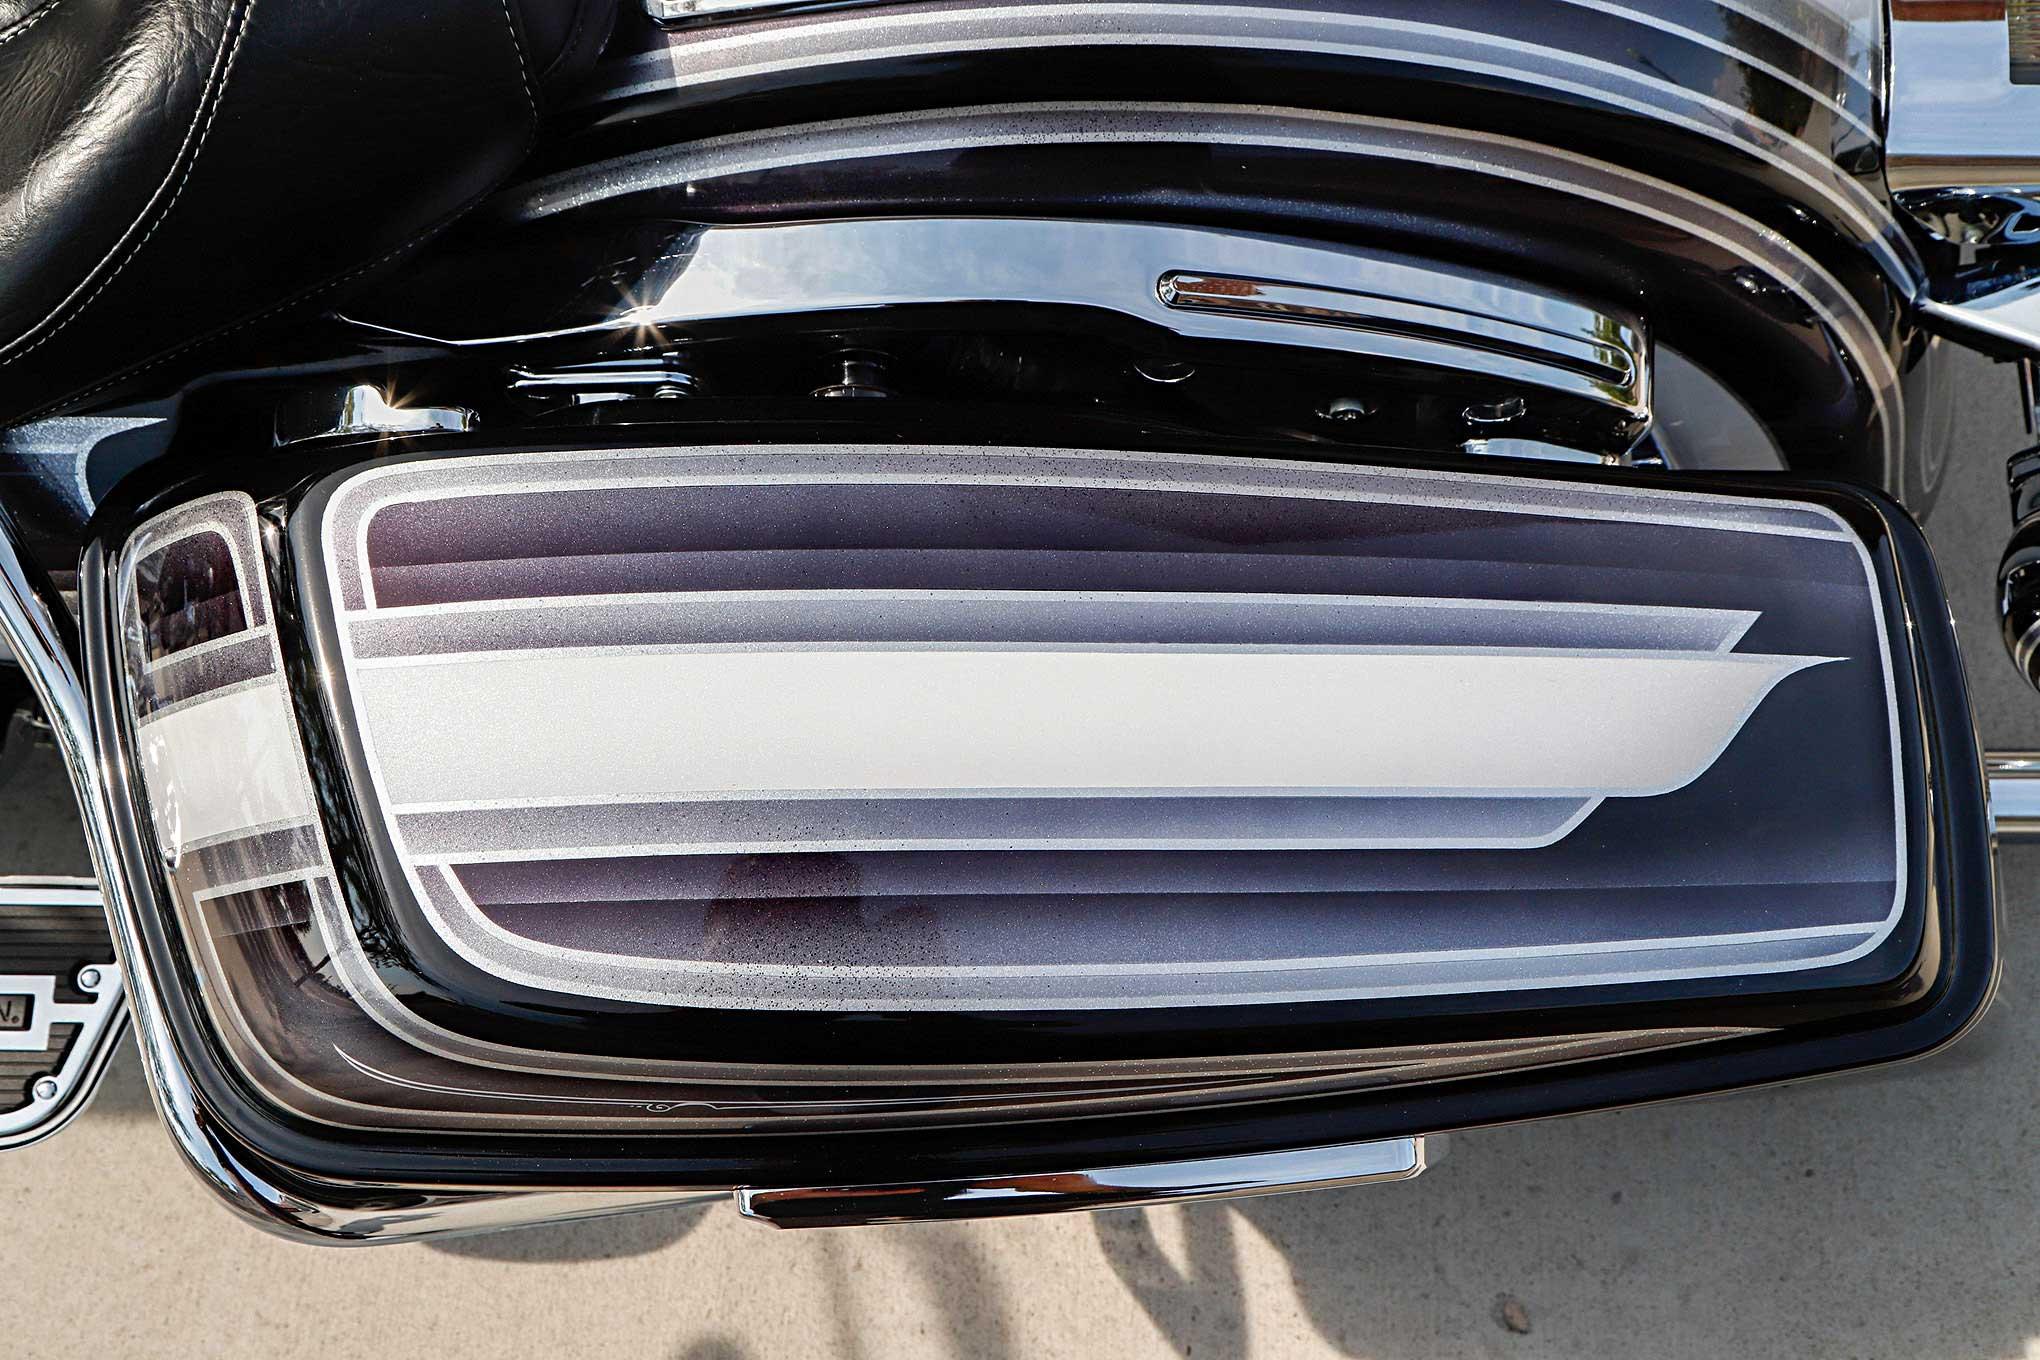 2014 Harley Davidson Road King Internal Wiring For Harley Davidson